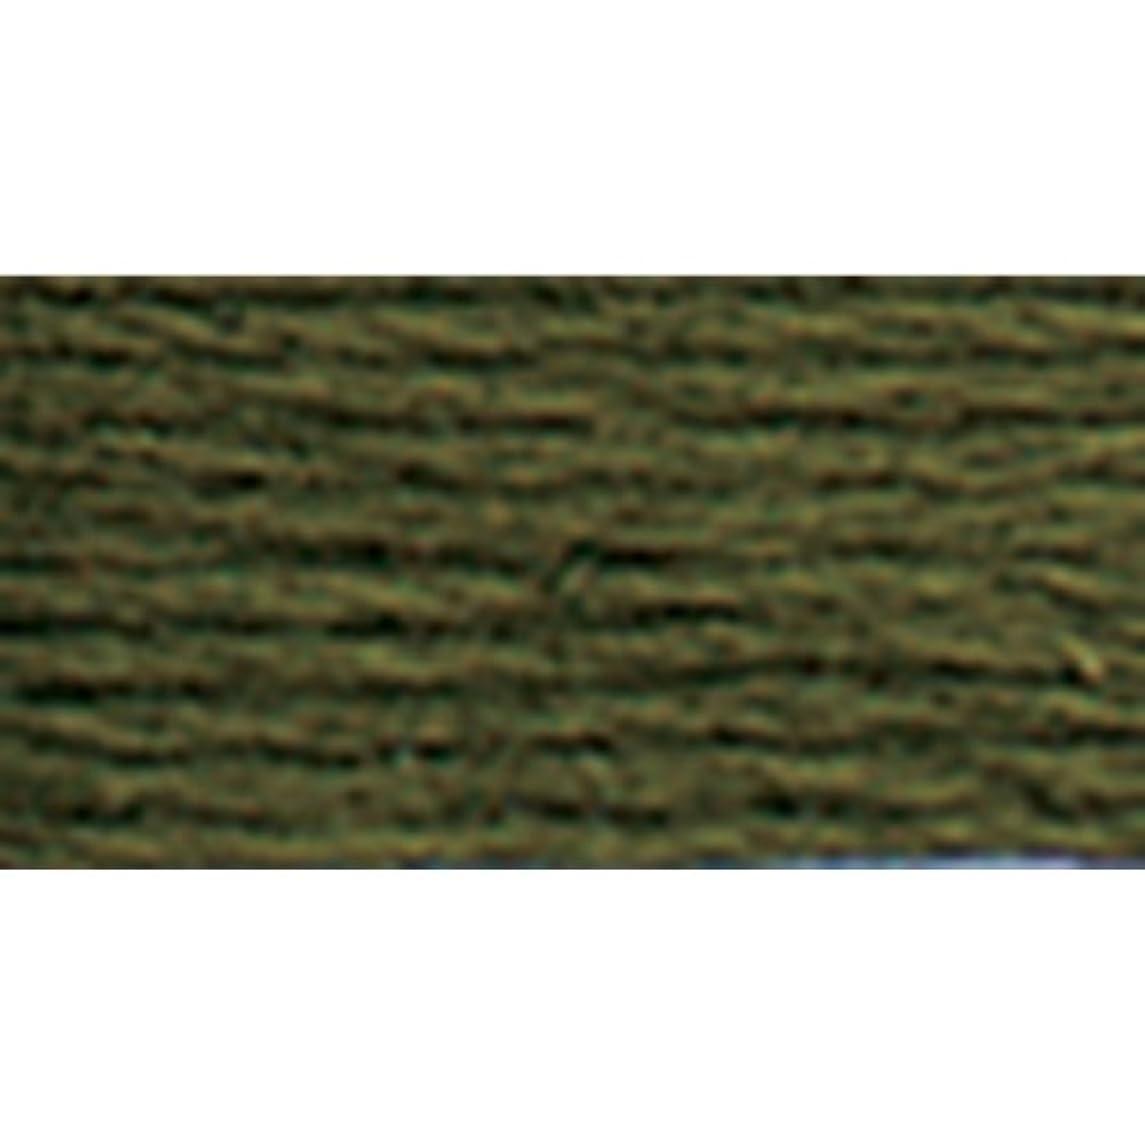 DMC 117-936 6 Strand Embroidery Cotton Floss, Very Dark Avocado Green, 8.7-Yard